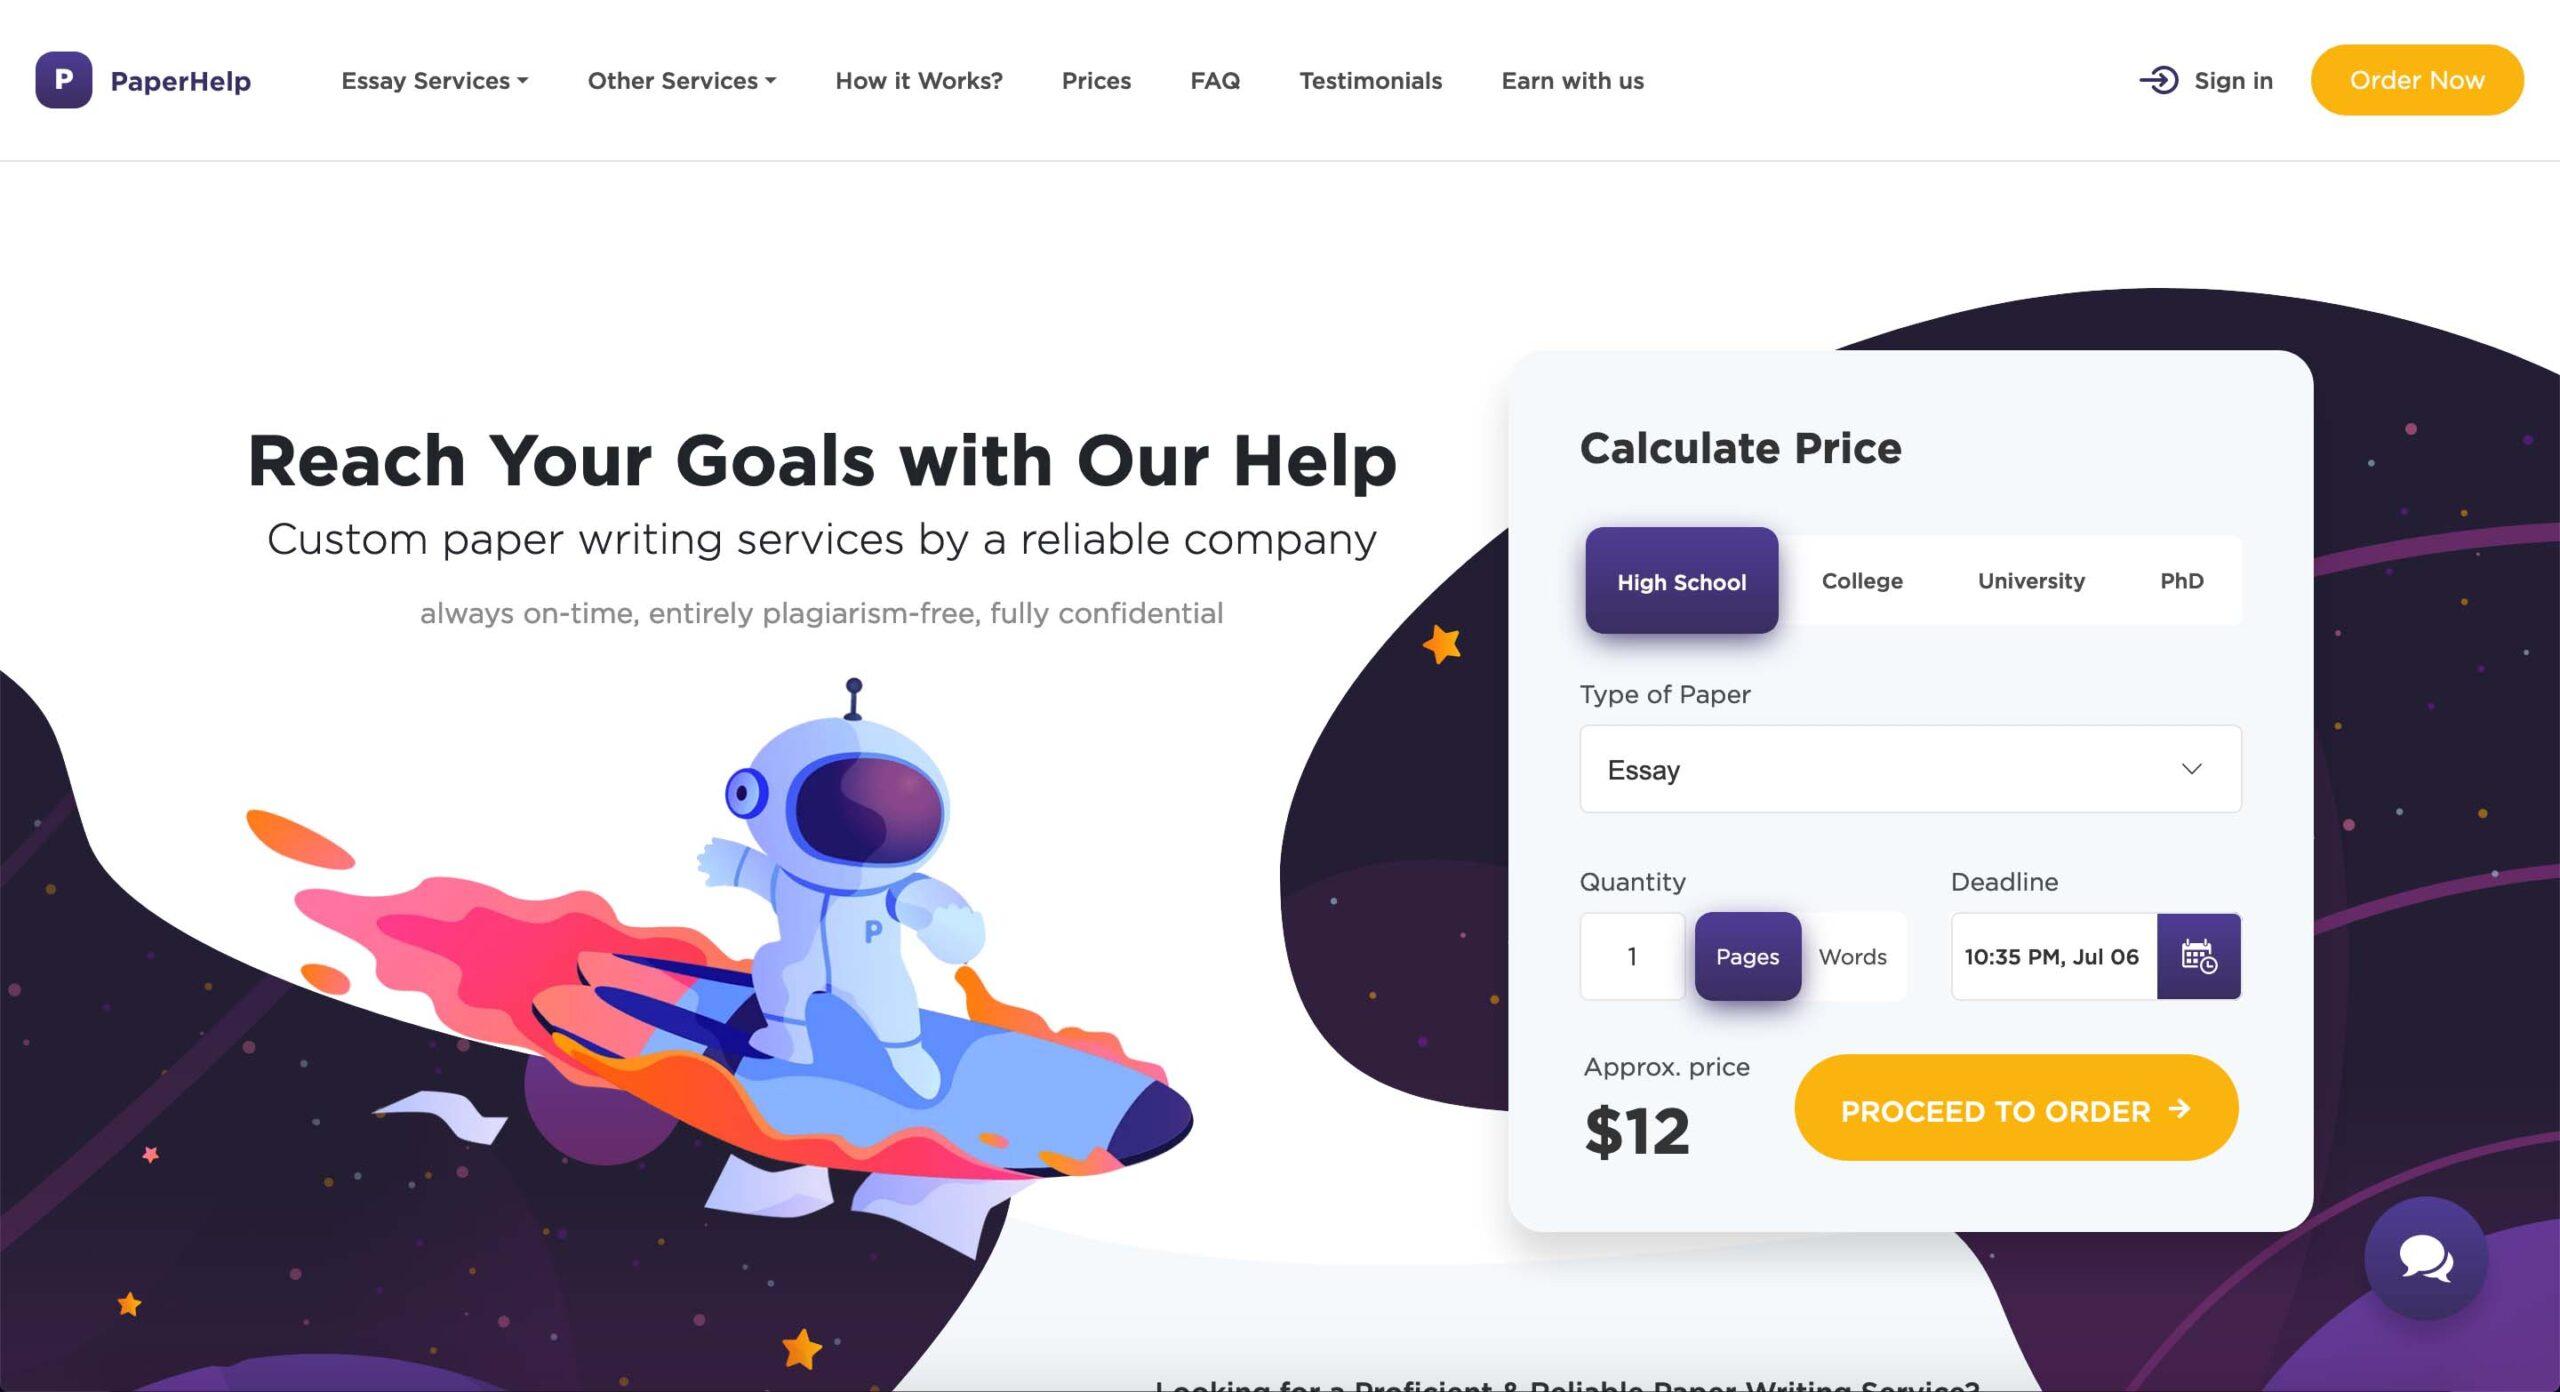 PaperHelp.org website